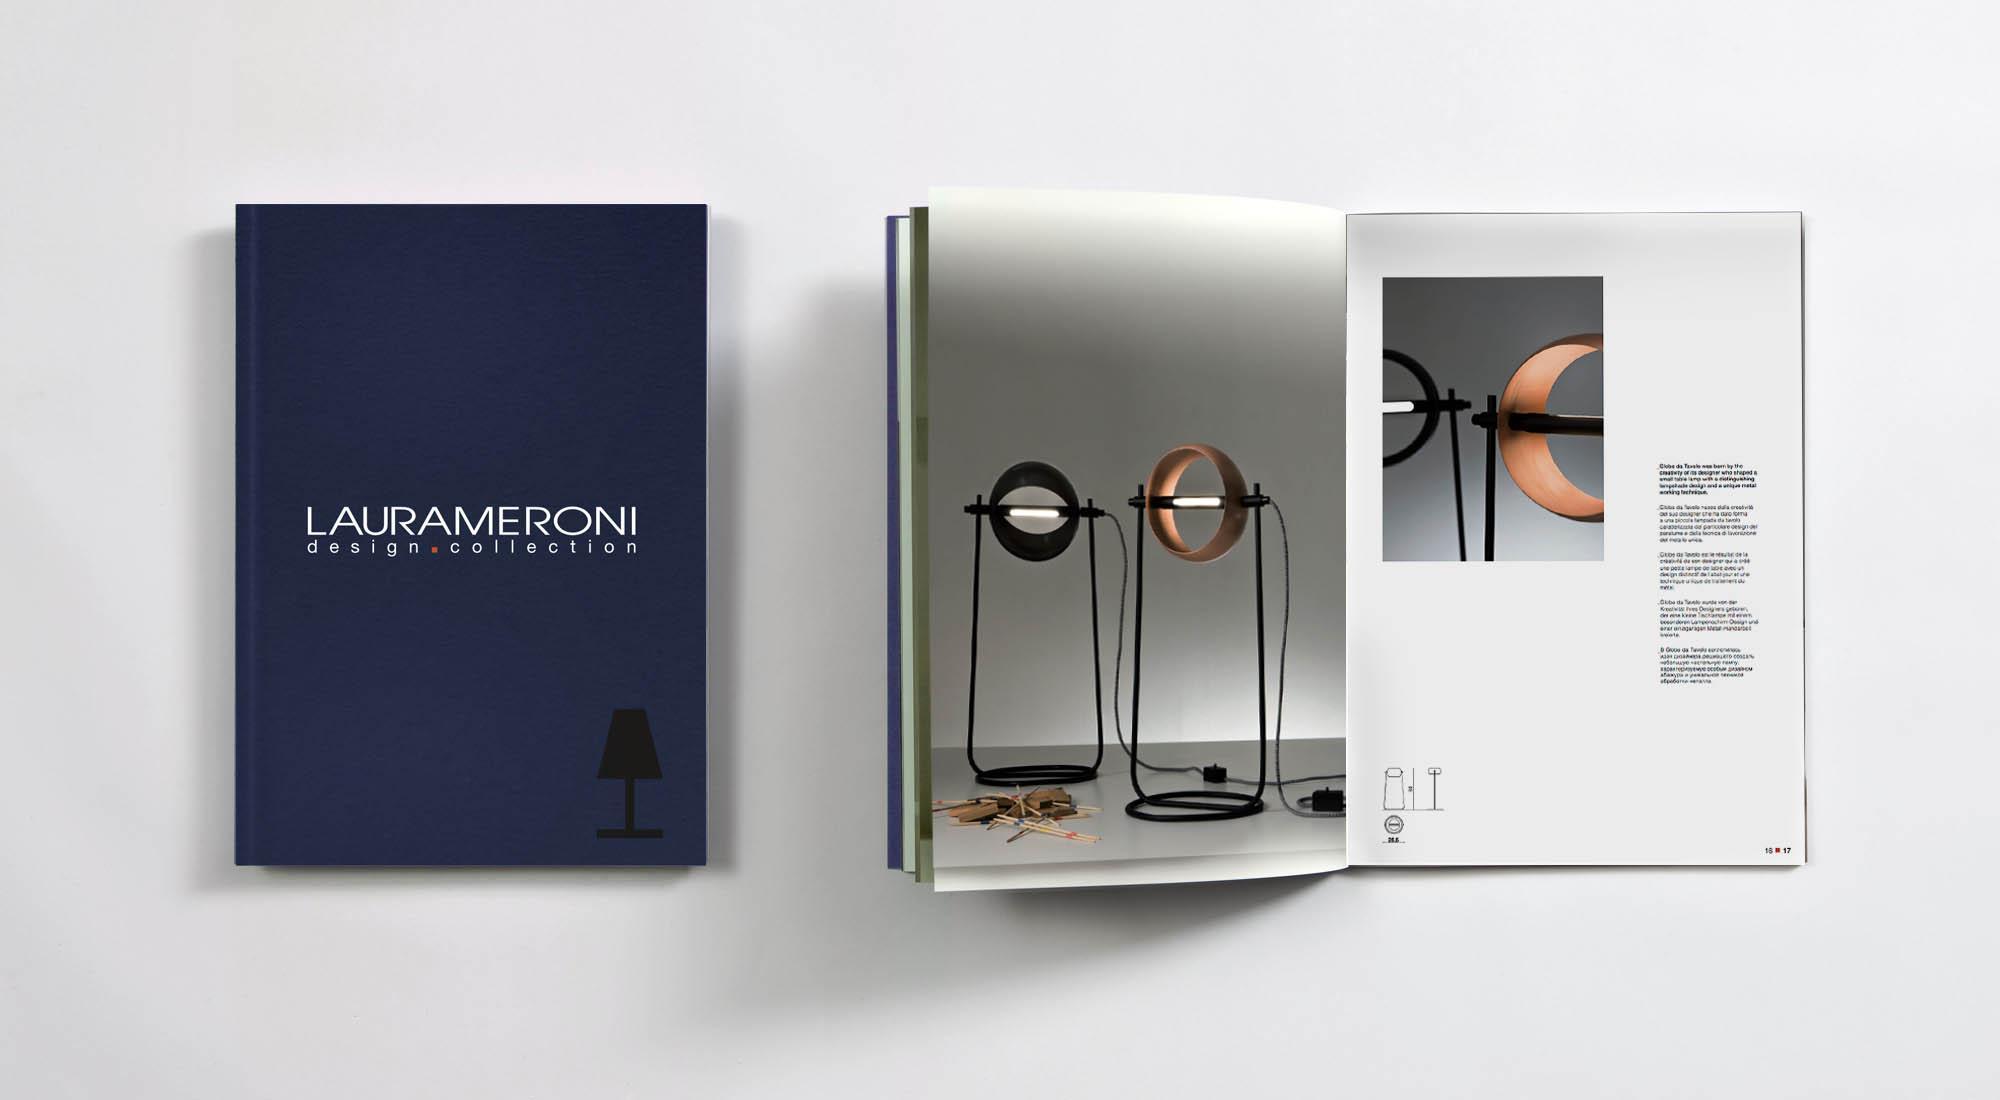 laurameroni luxury light design catalogue free download